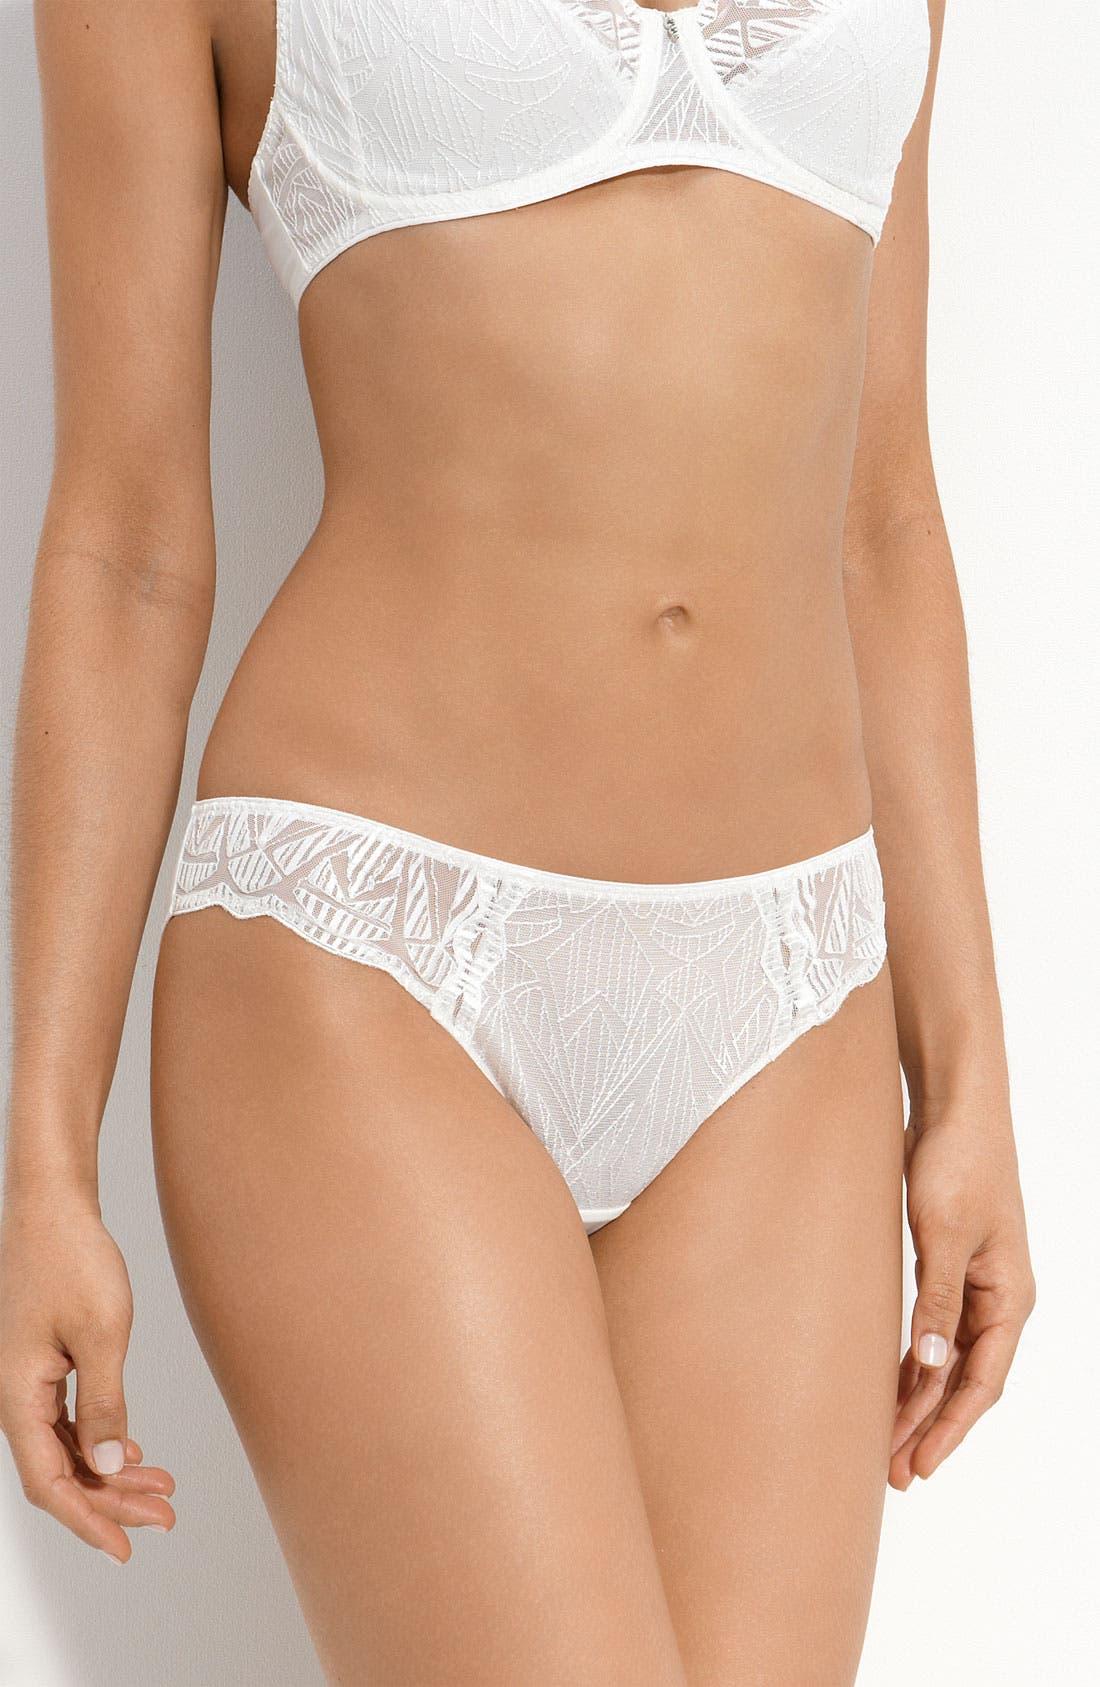 Alternate Image 1 Selected - Chantelle Intimates 'Fascination' Bikini